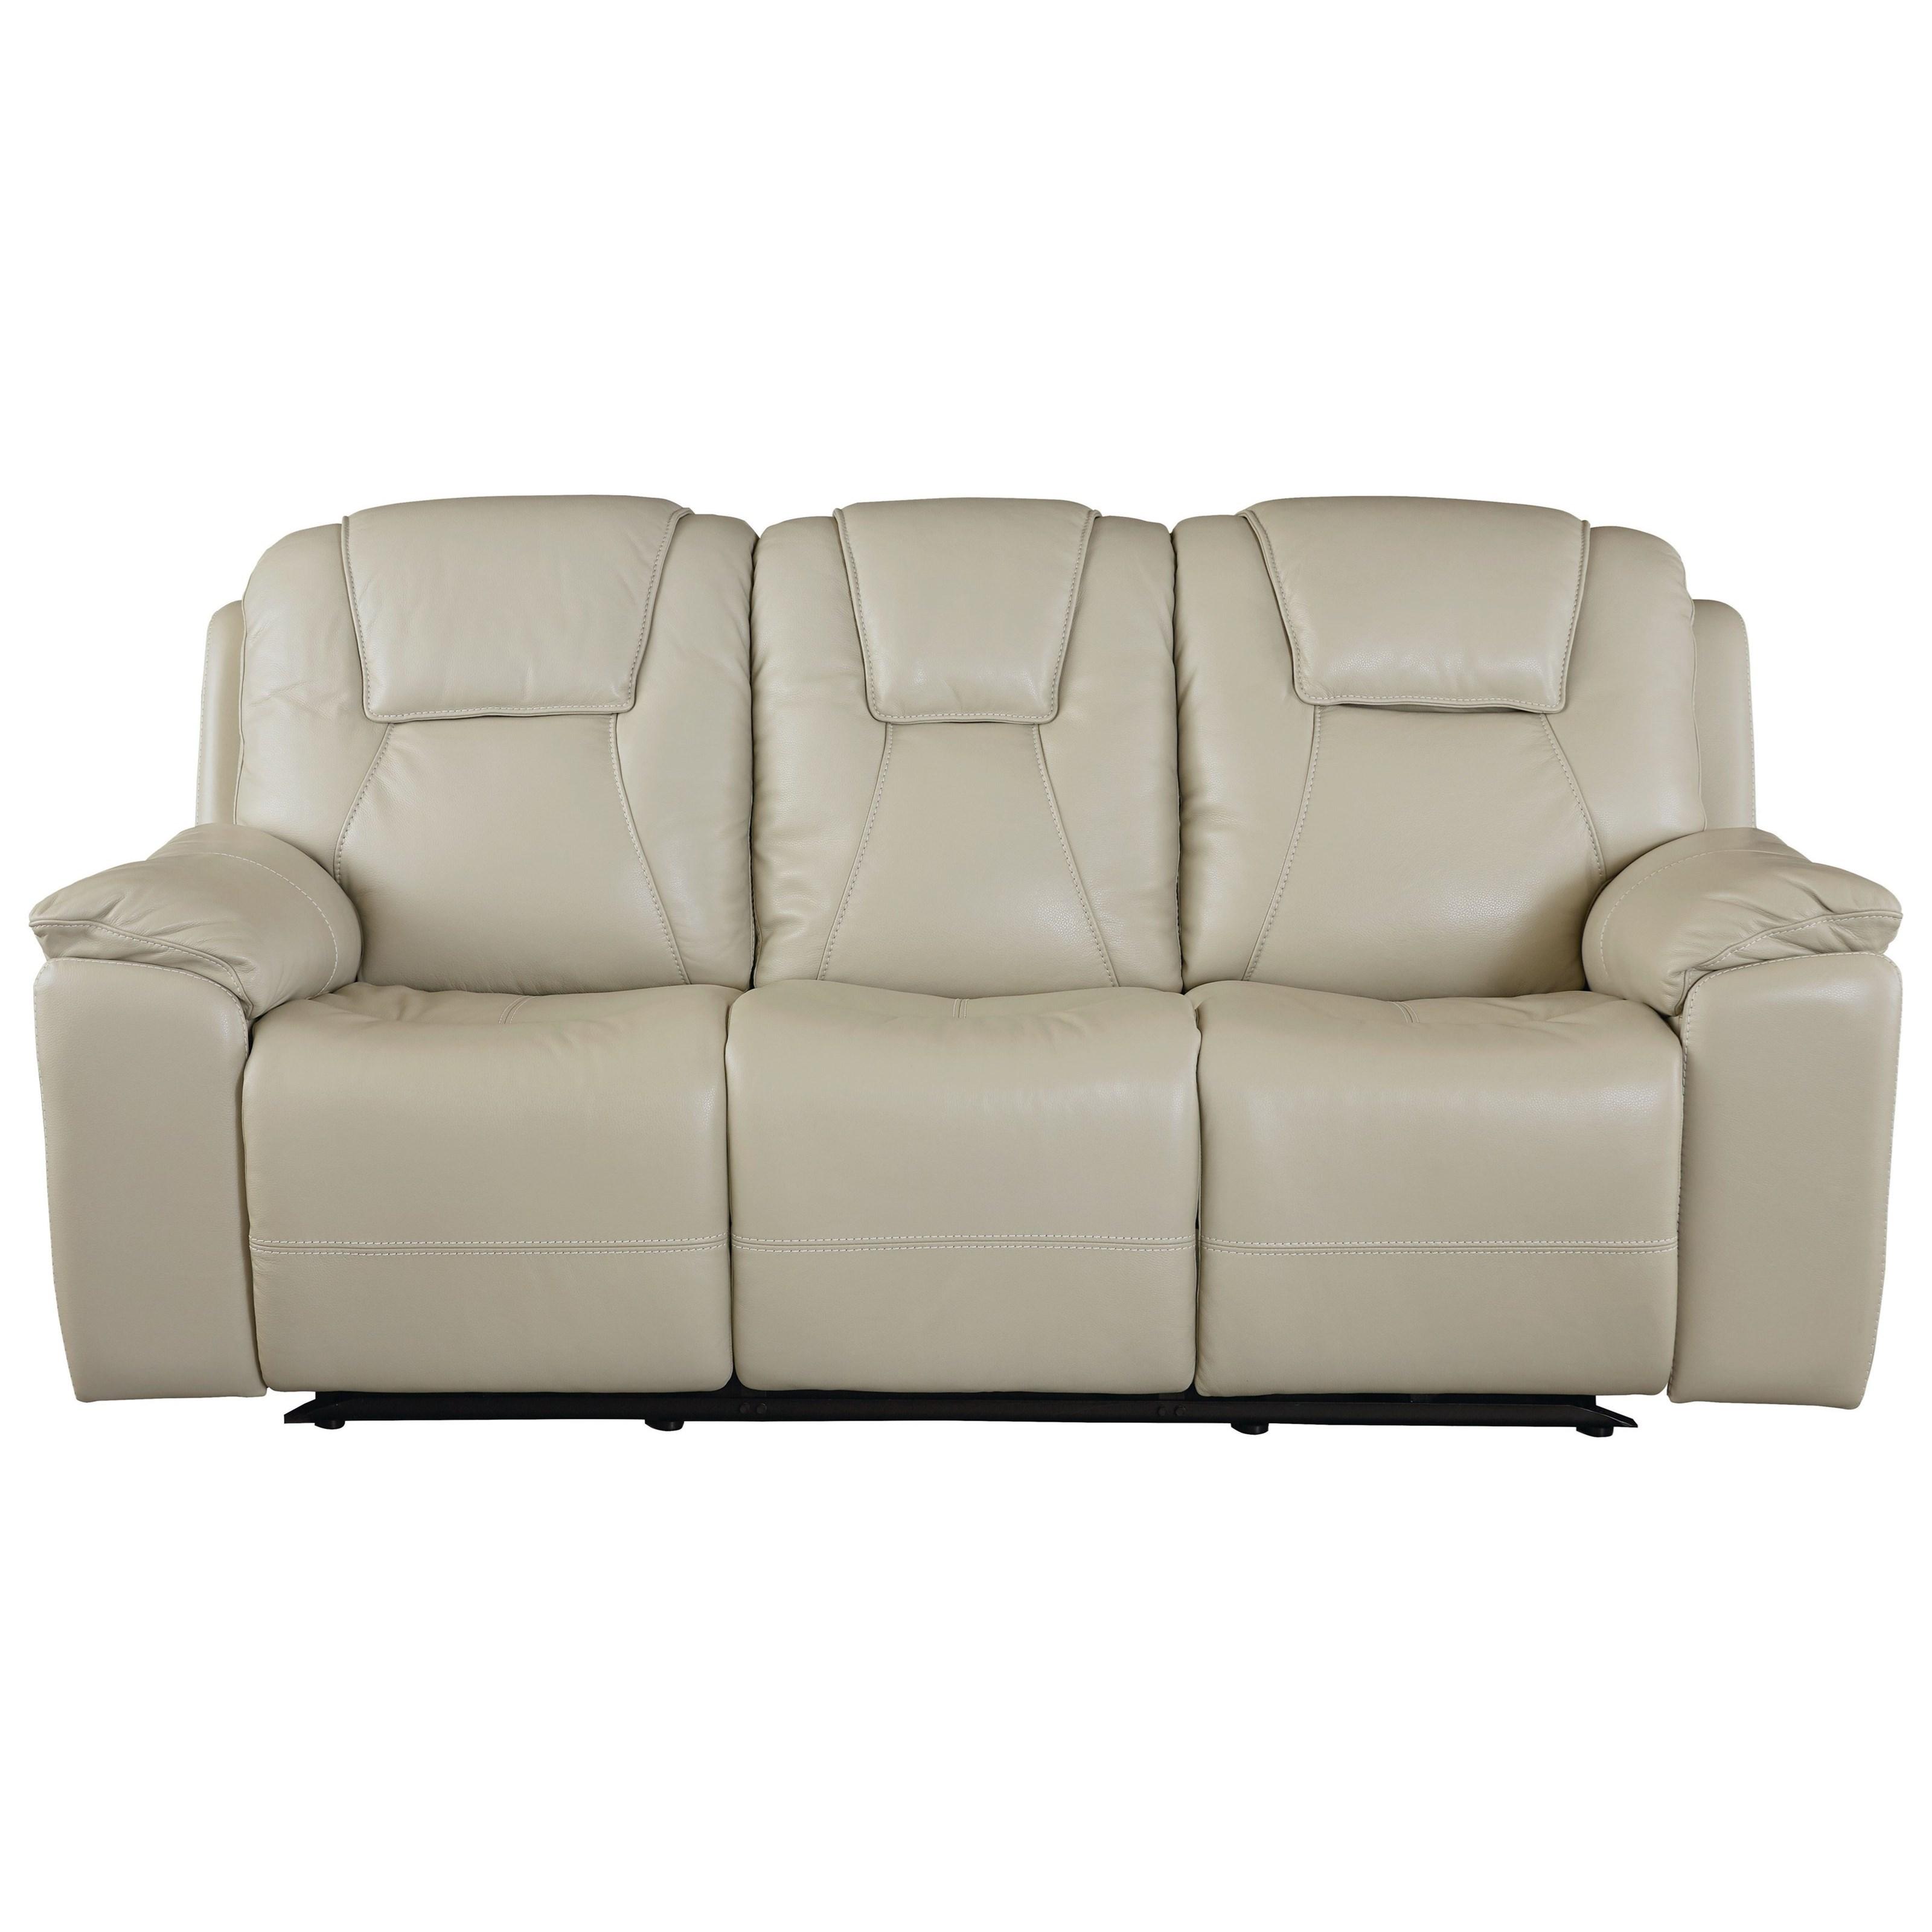 Club Level - Chandler Reclining Sofa by Bassett at Williams & Kay